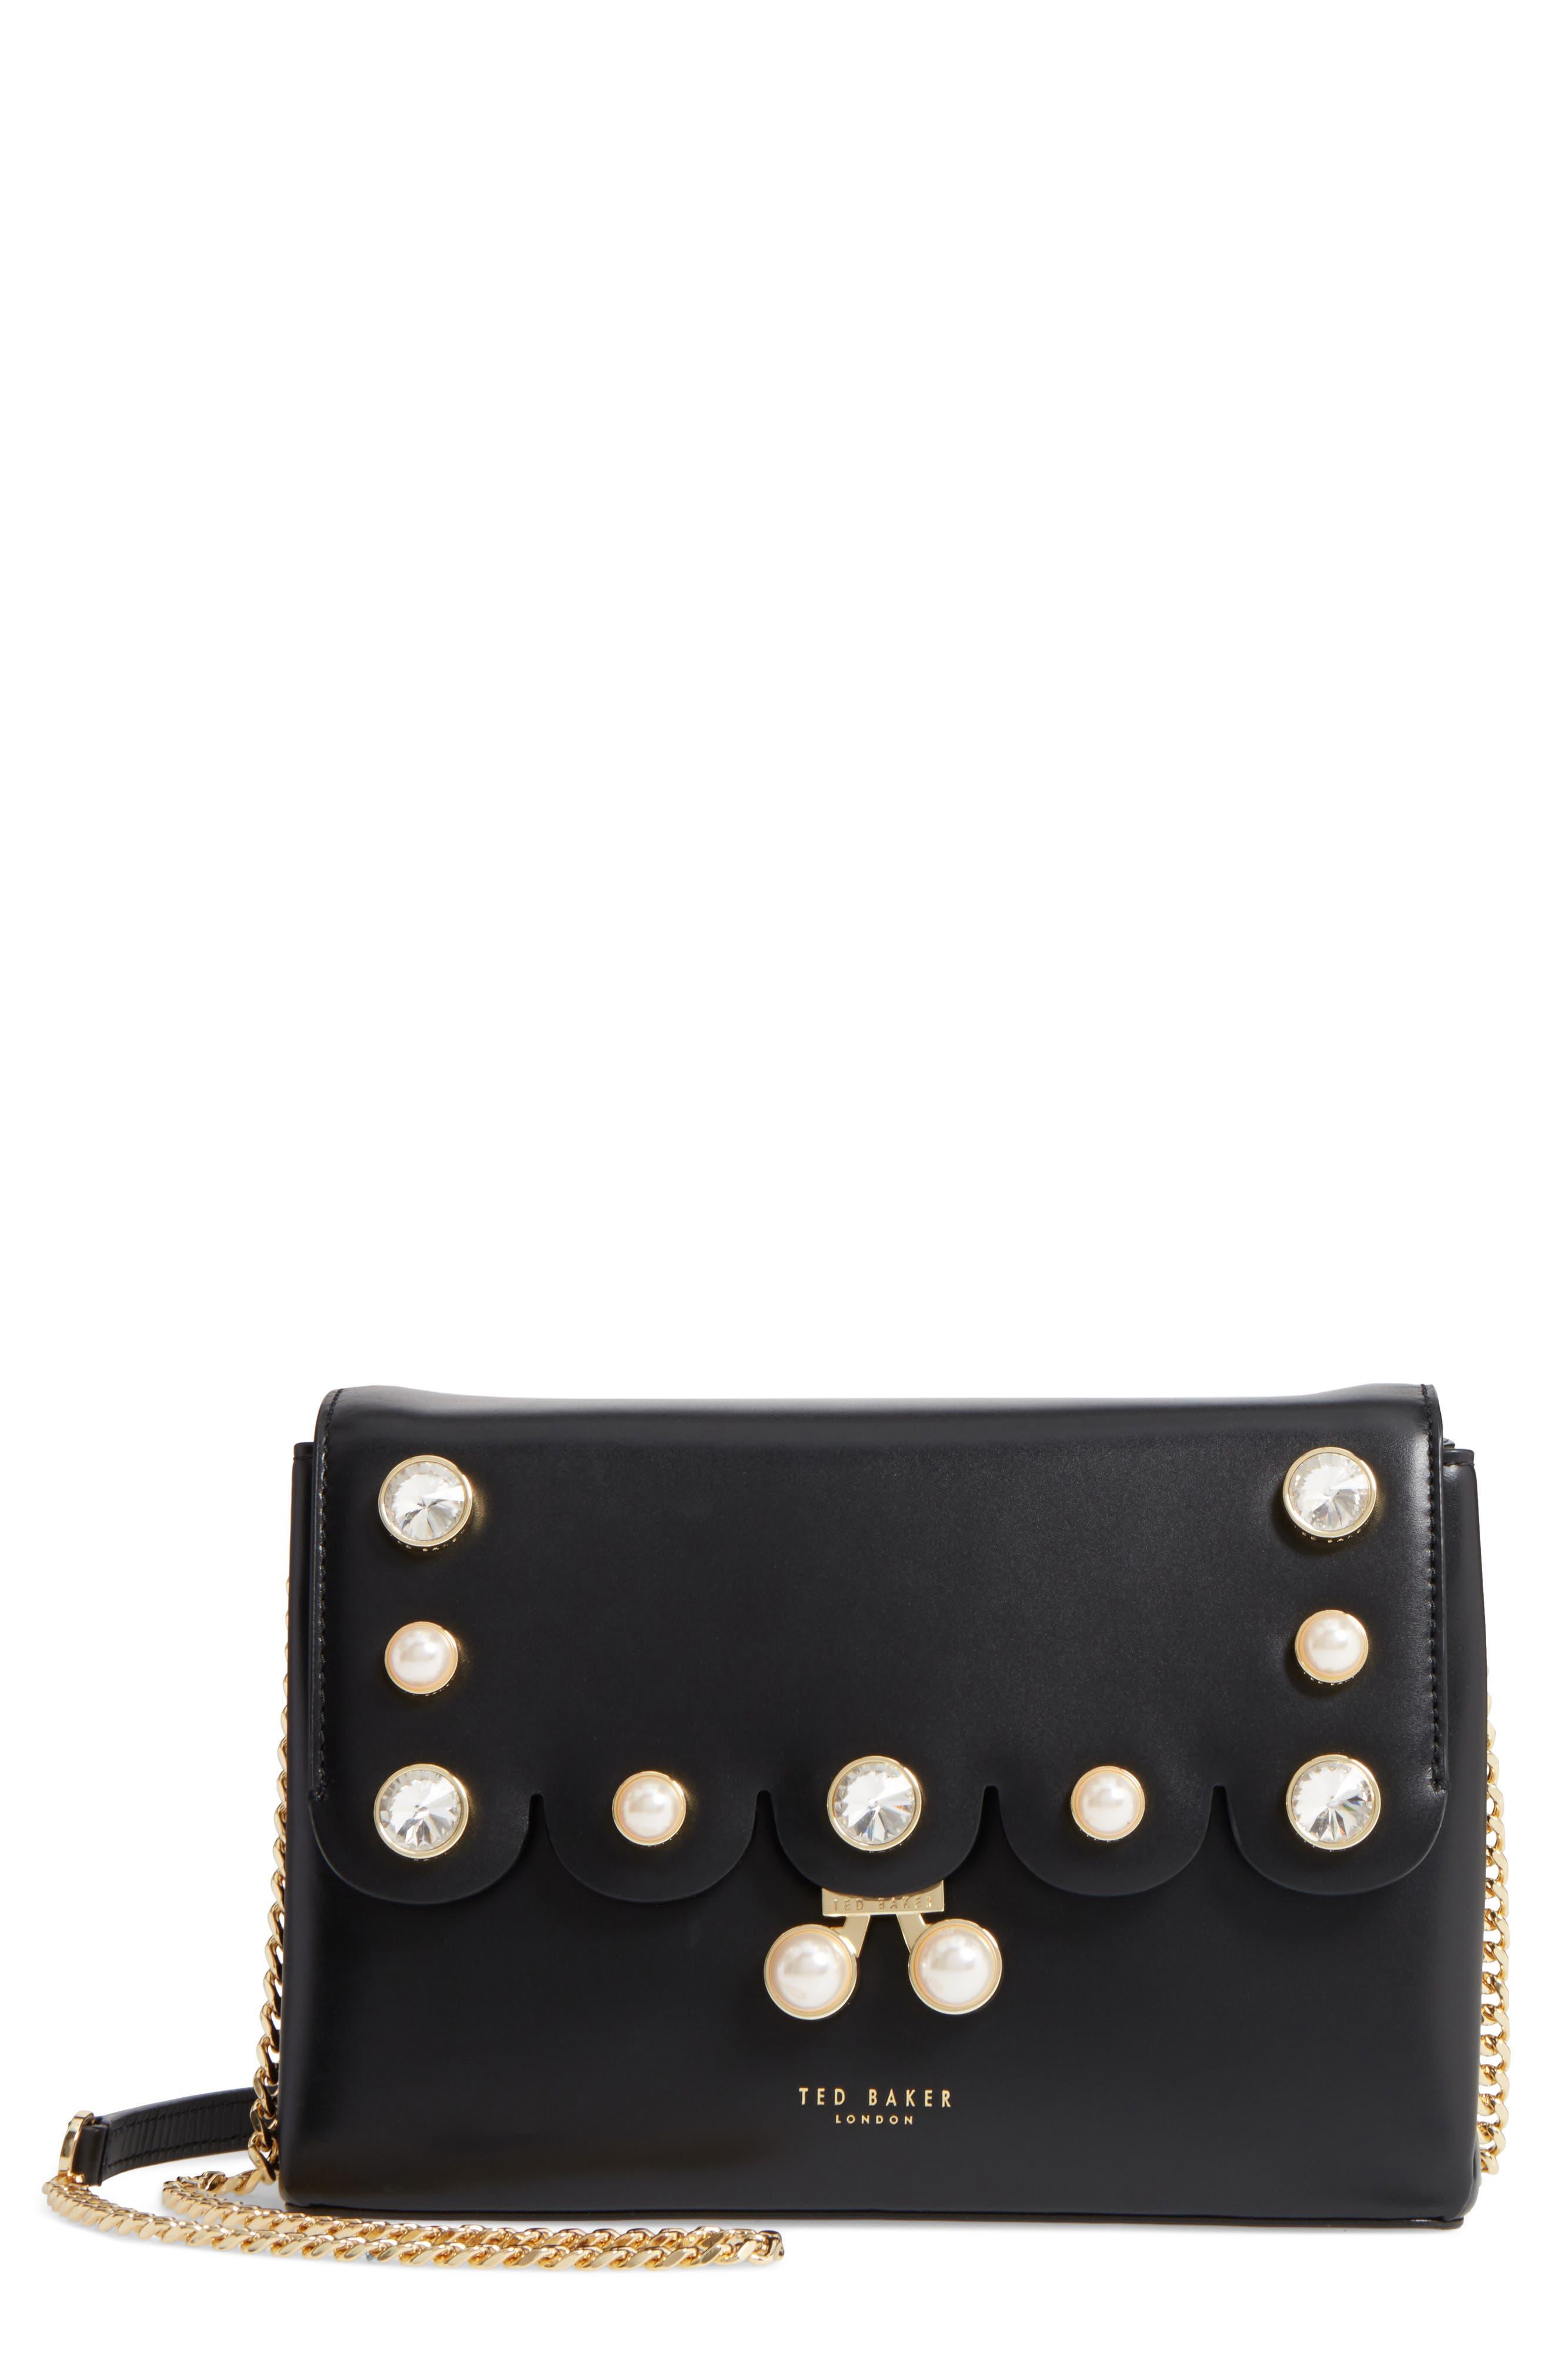 Saraa Leather Crossbody Bag,                             Main thumbnail 1, color,                             001